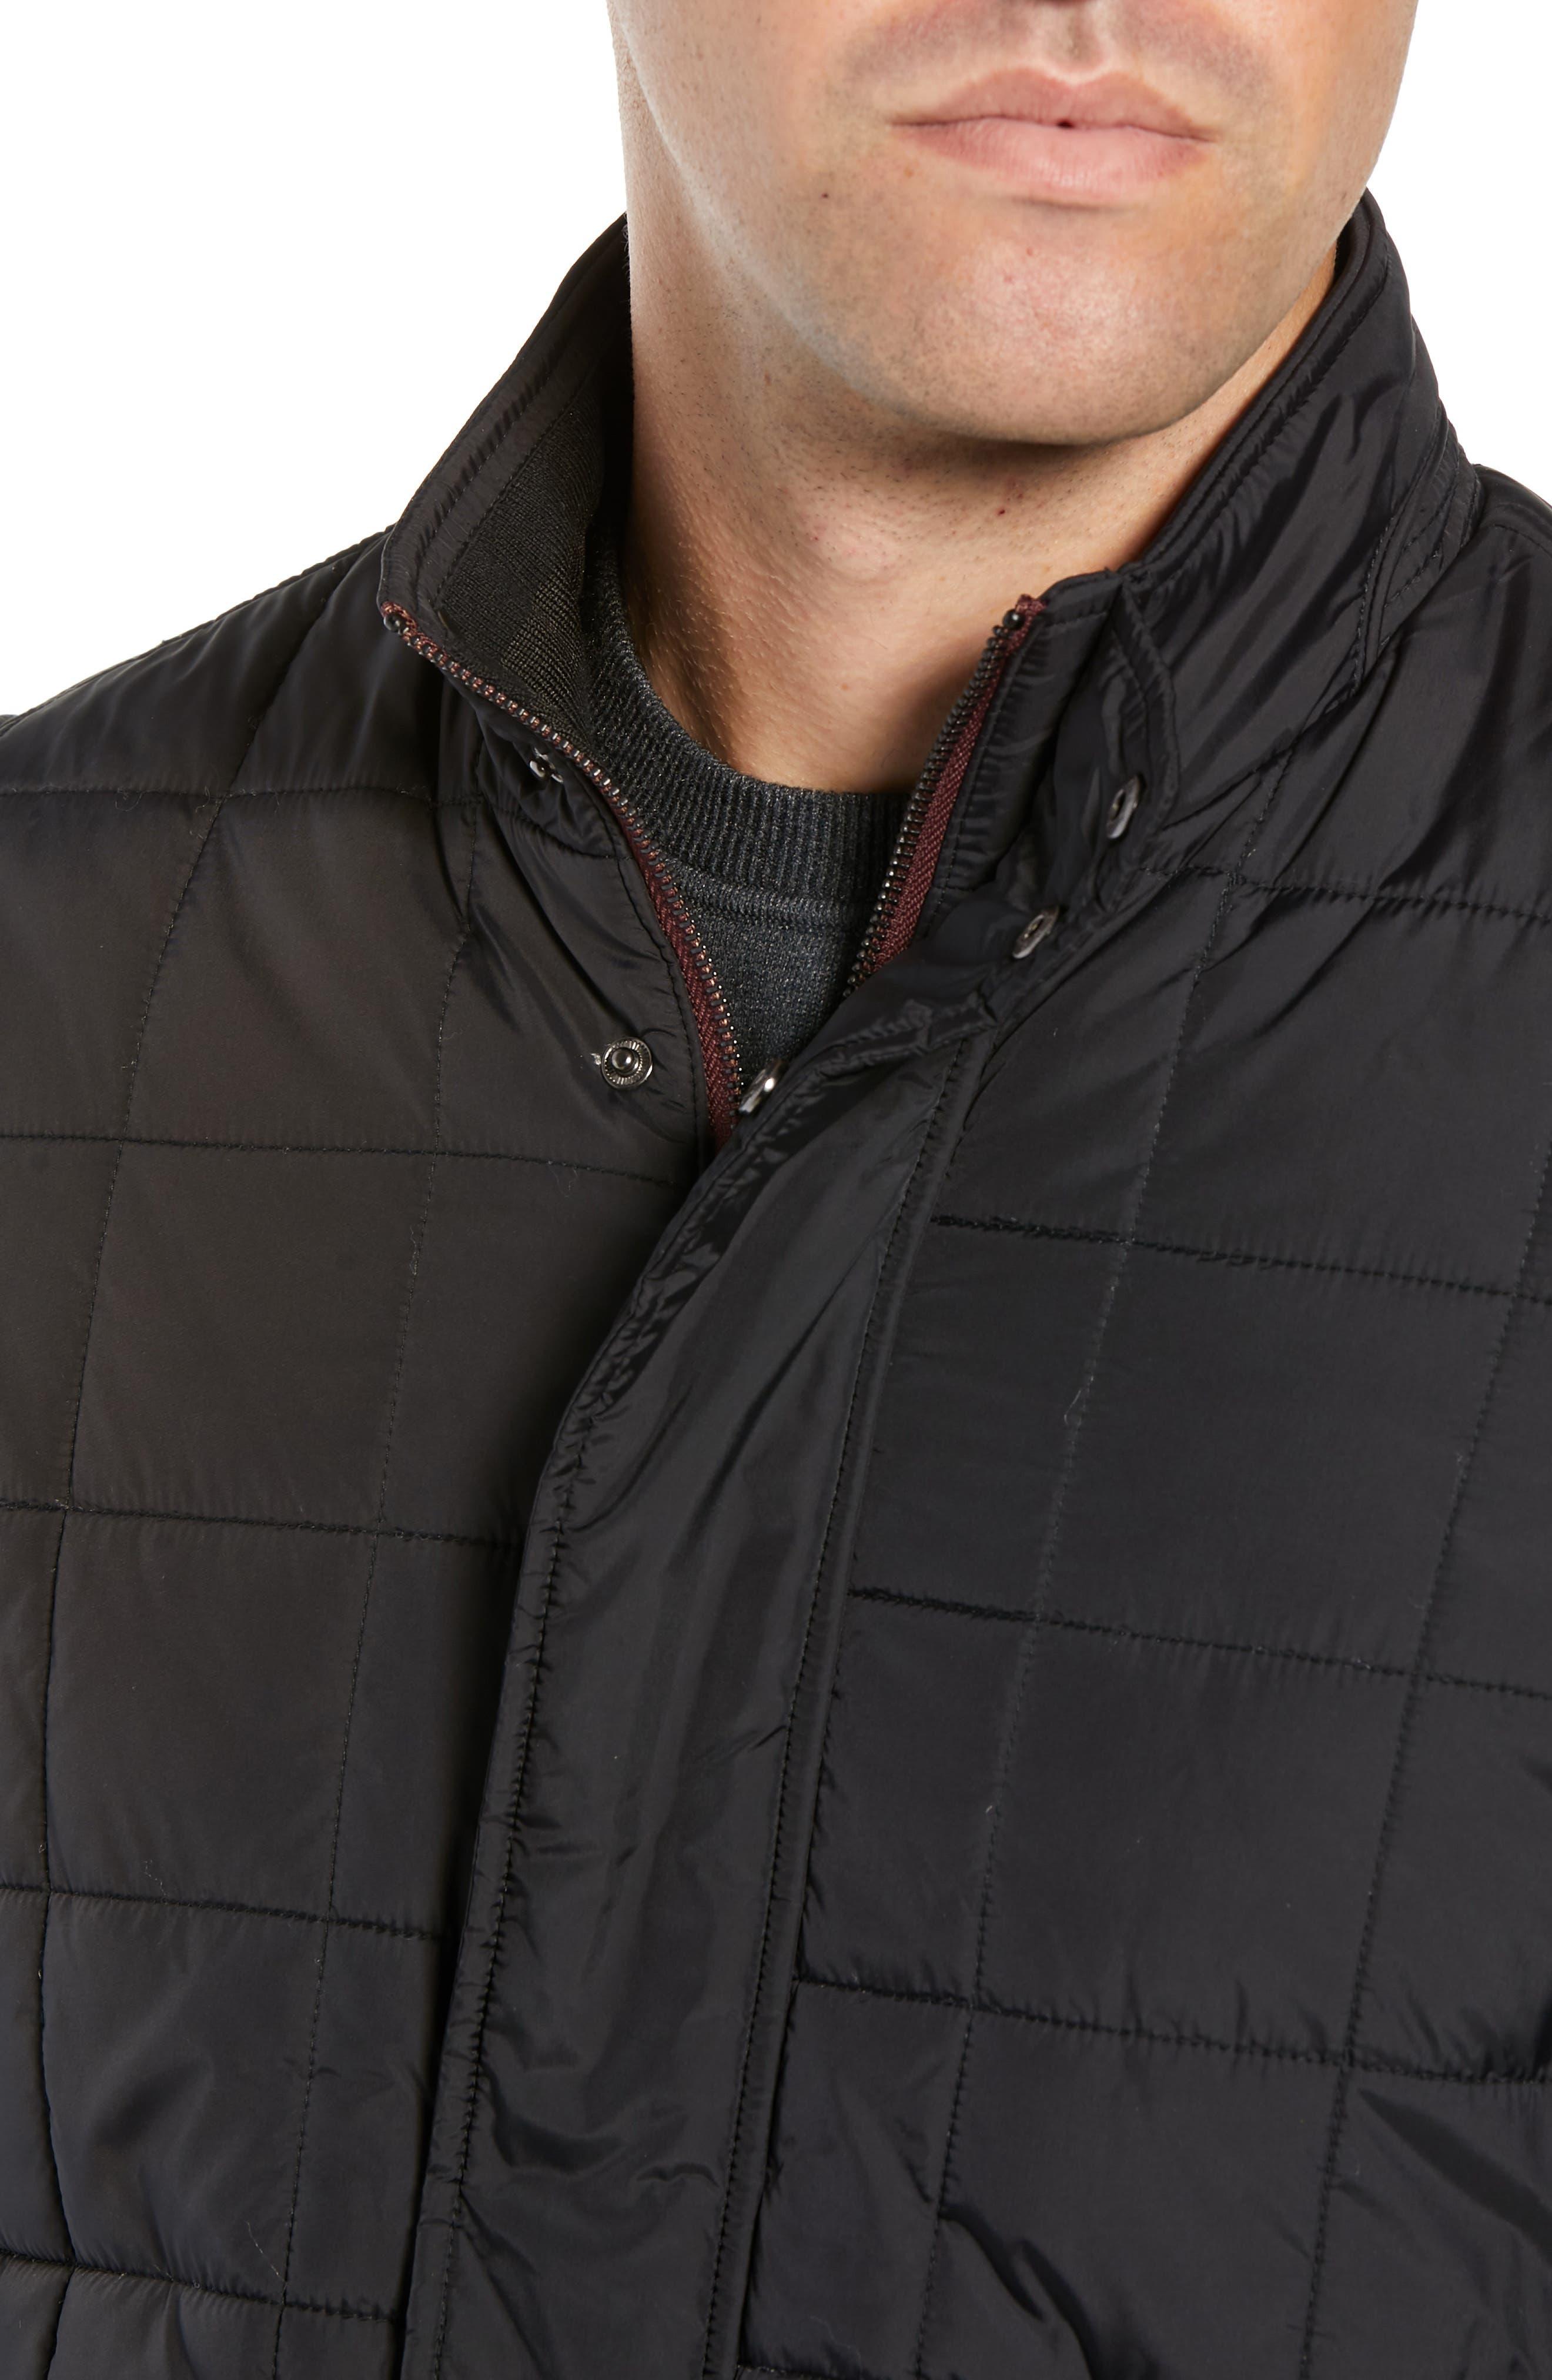 Lesta Quilted Slim Fit Jacket,                             Alternate thumbnail 4, color,                             BLACK